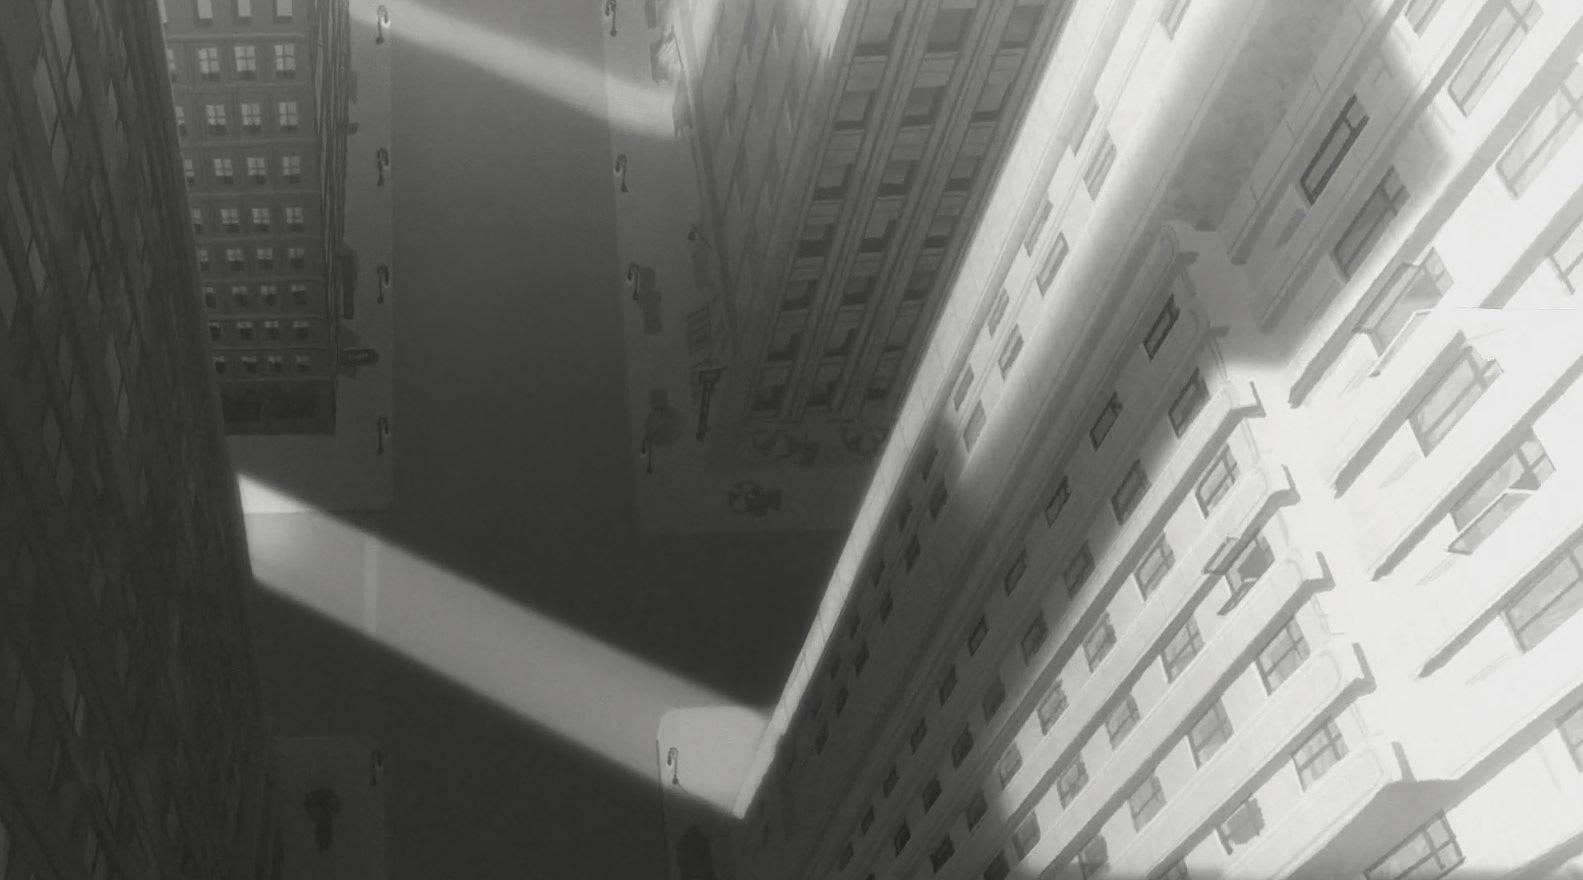 paperman-background-11.jpg